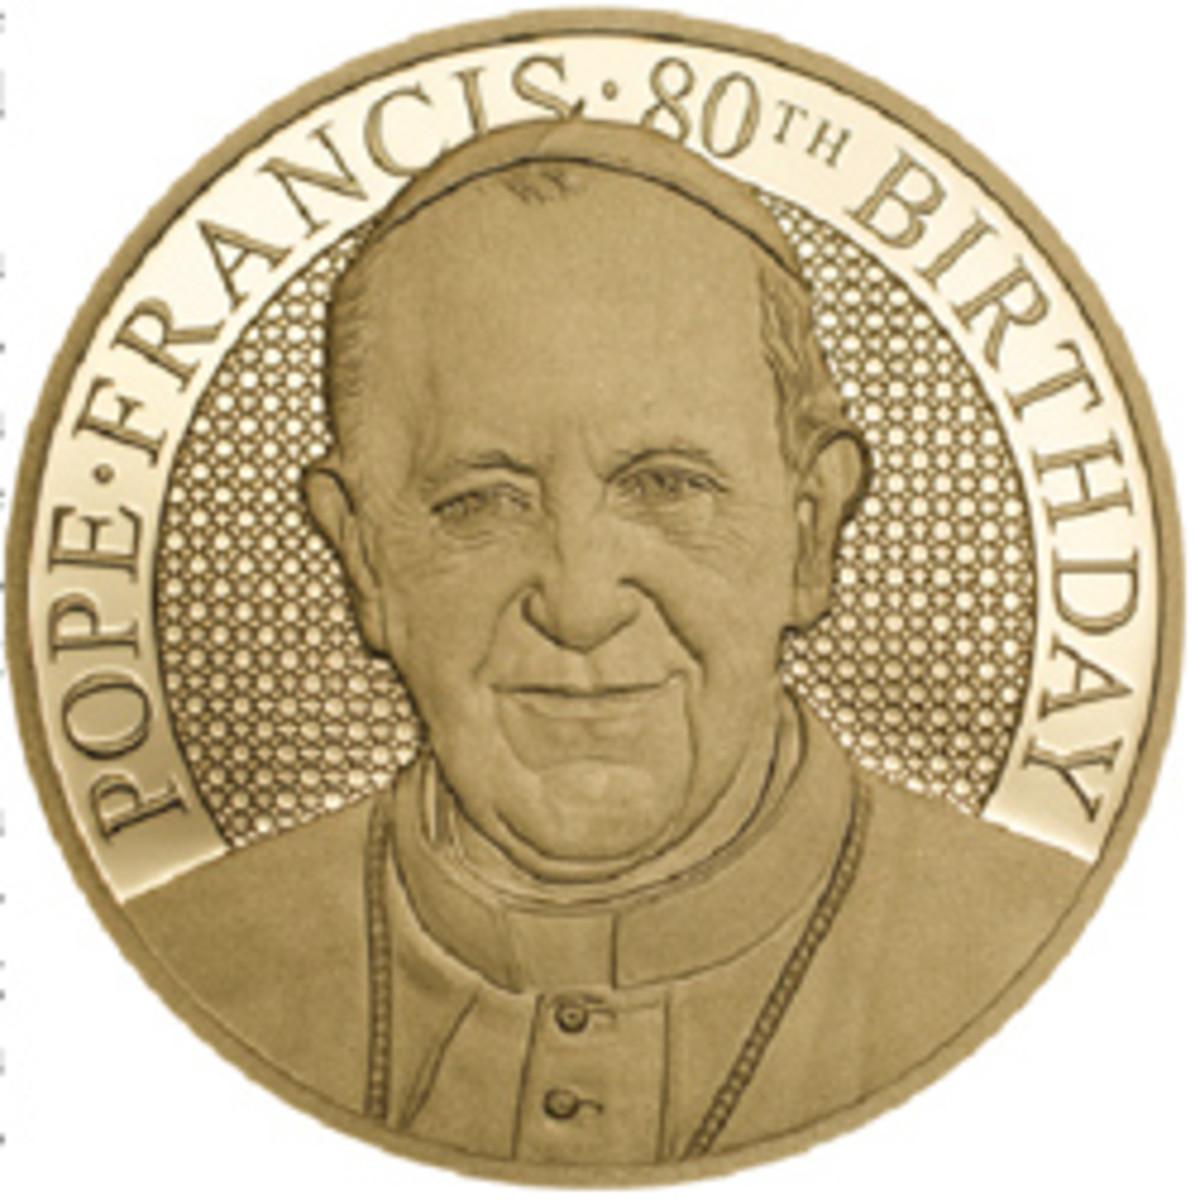 pope80th